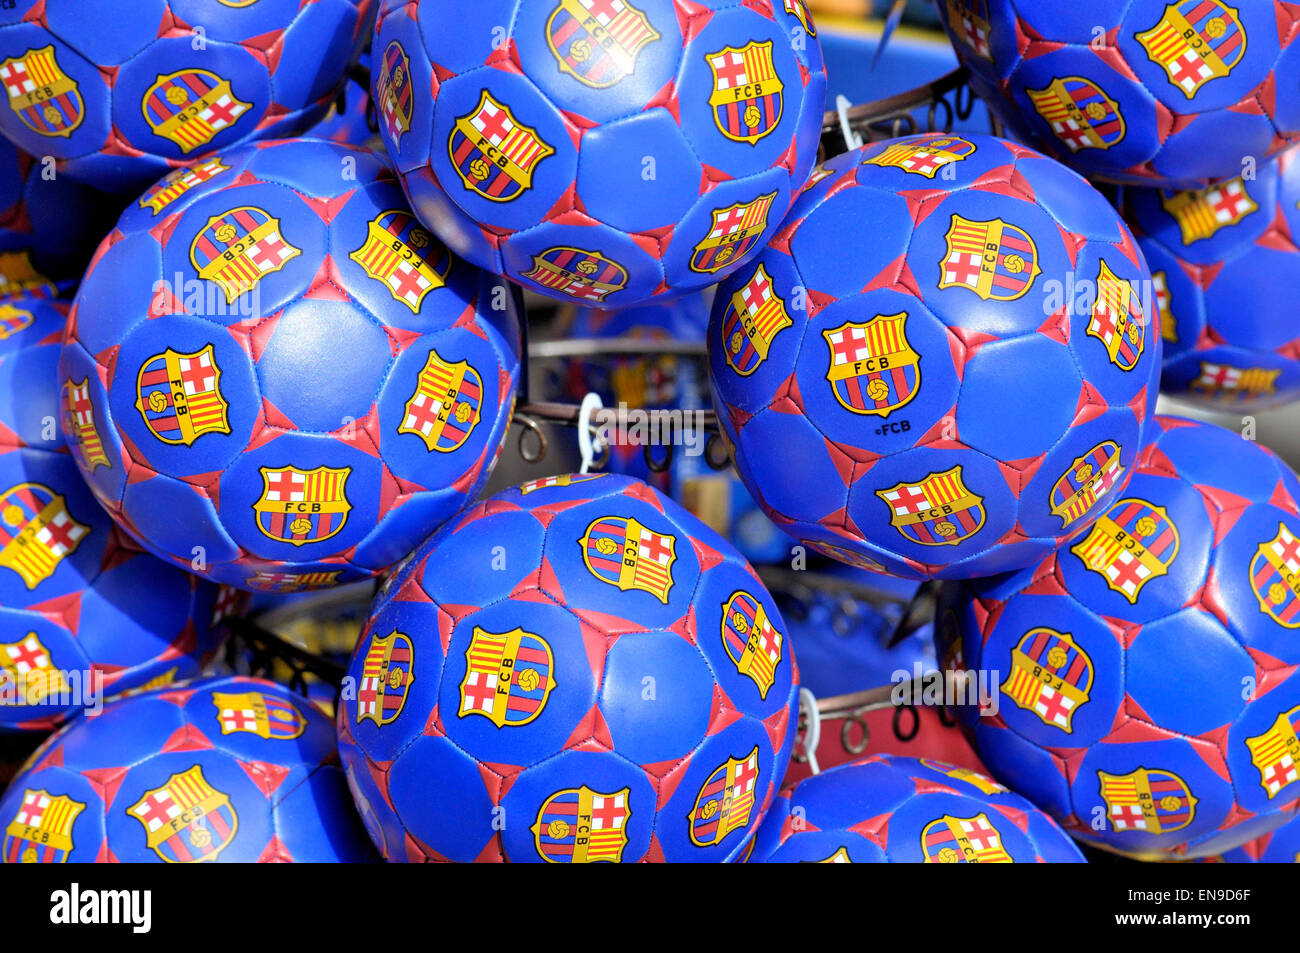 Soccer balls with logo of Football Club Barcelona - Stock Image